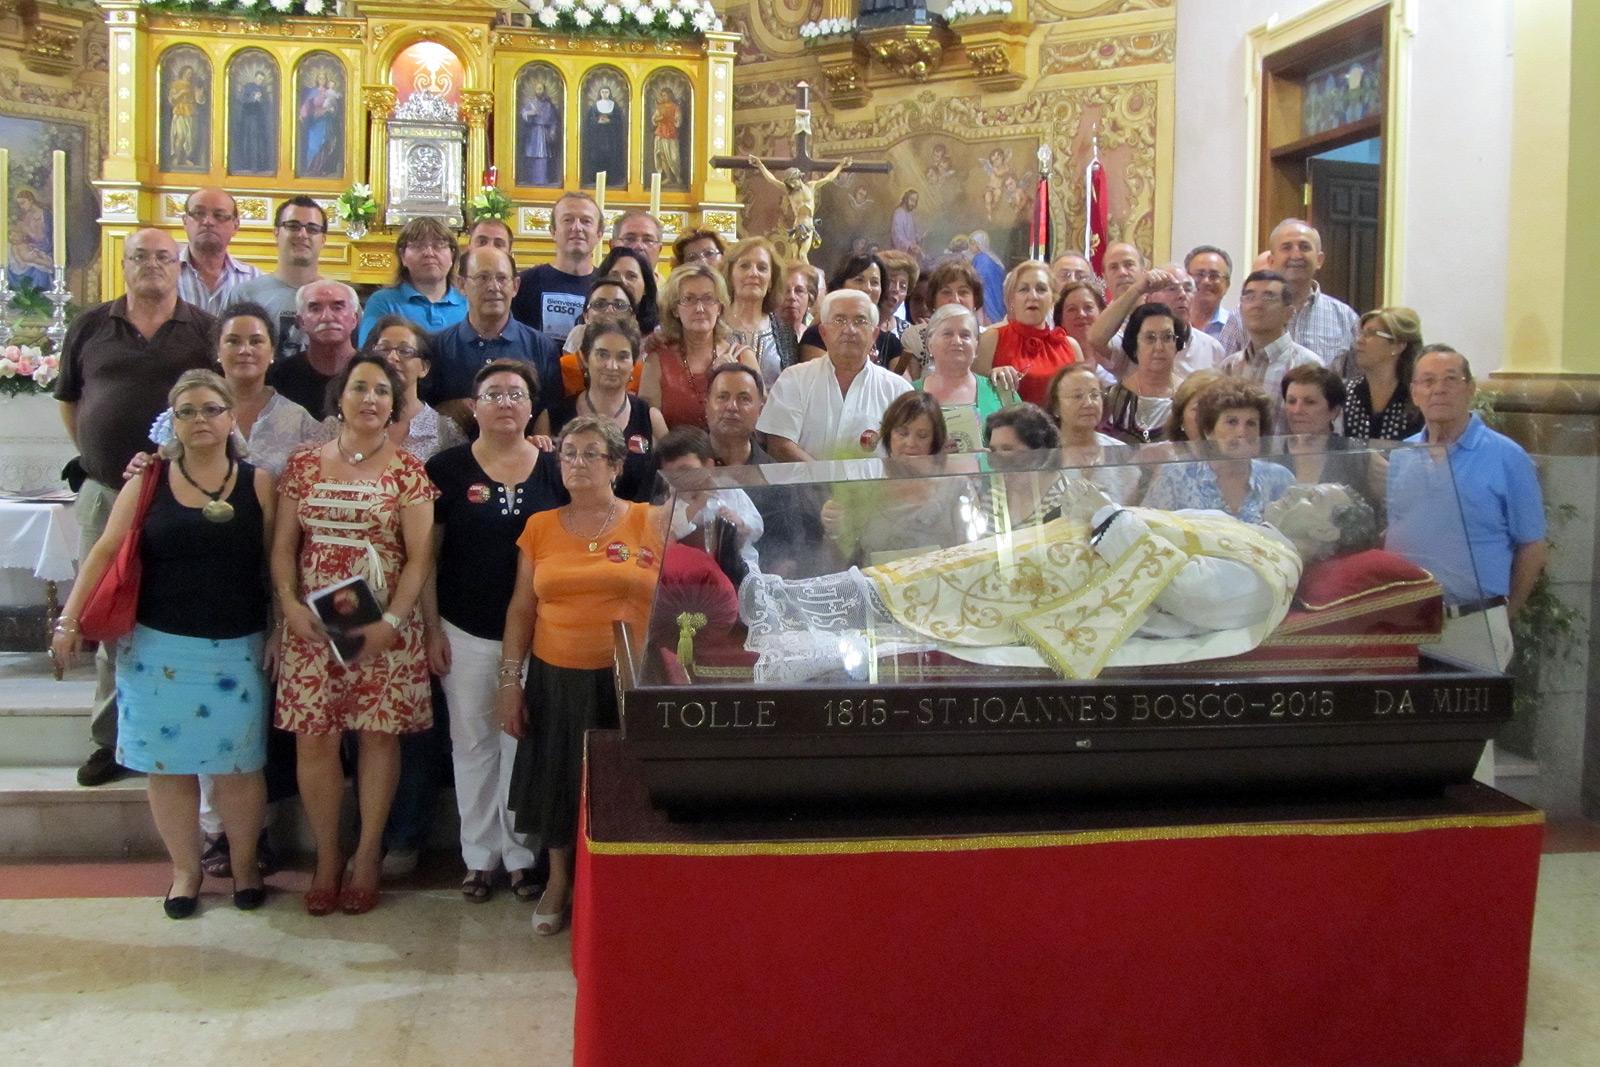 Junto a la urna de Don Bosco